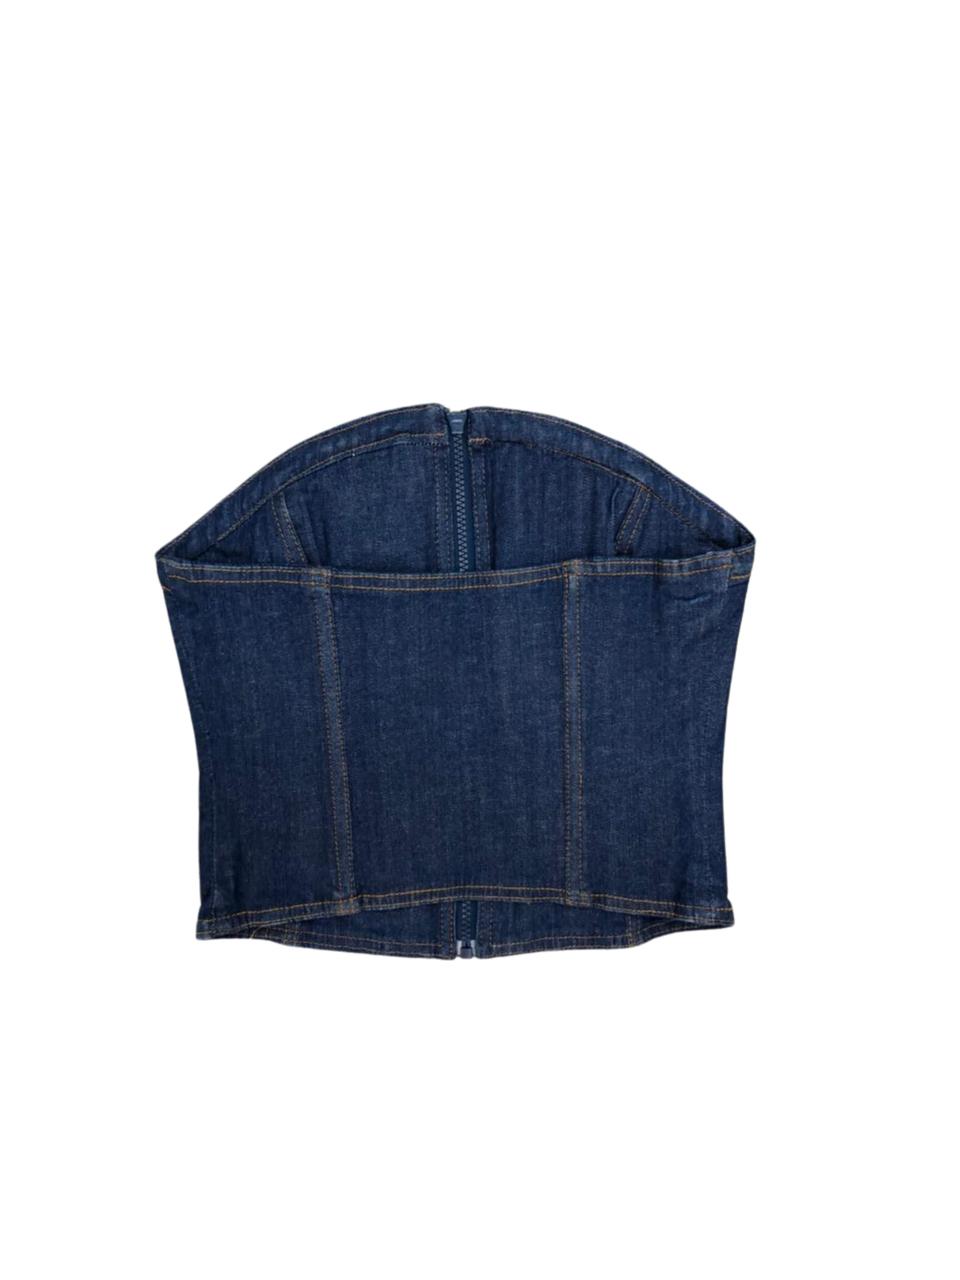 Corset jeans com zíper frontal